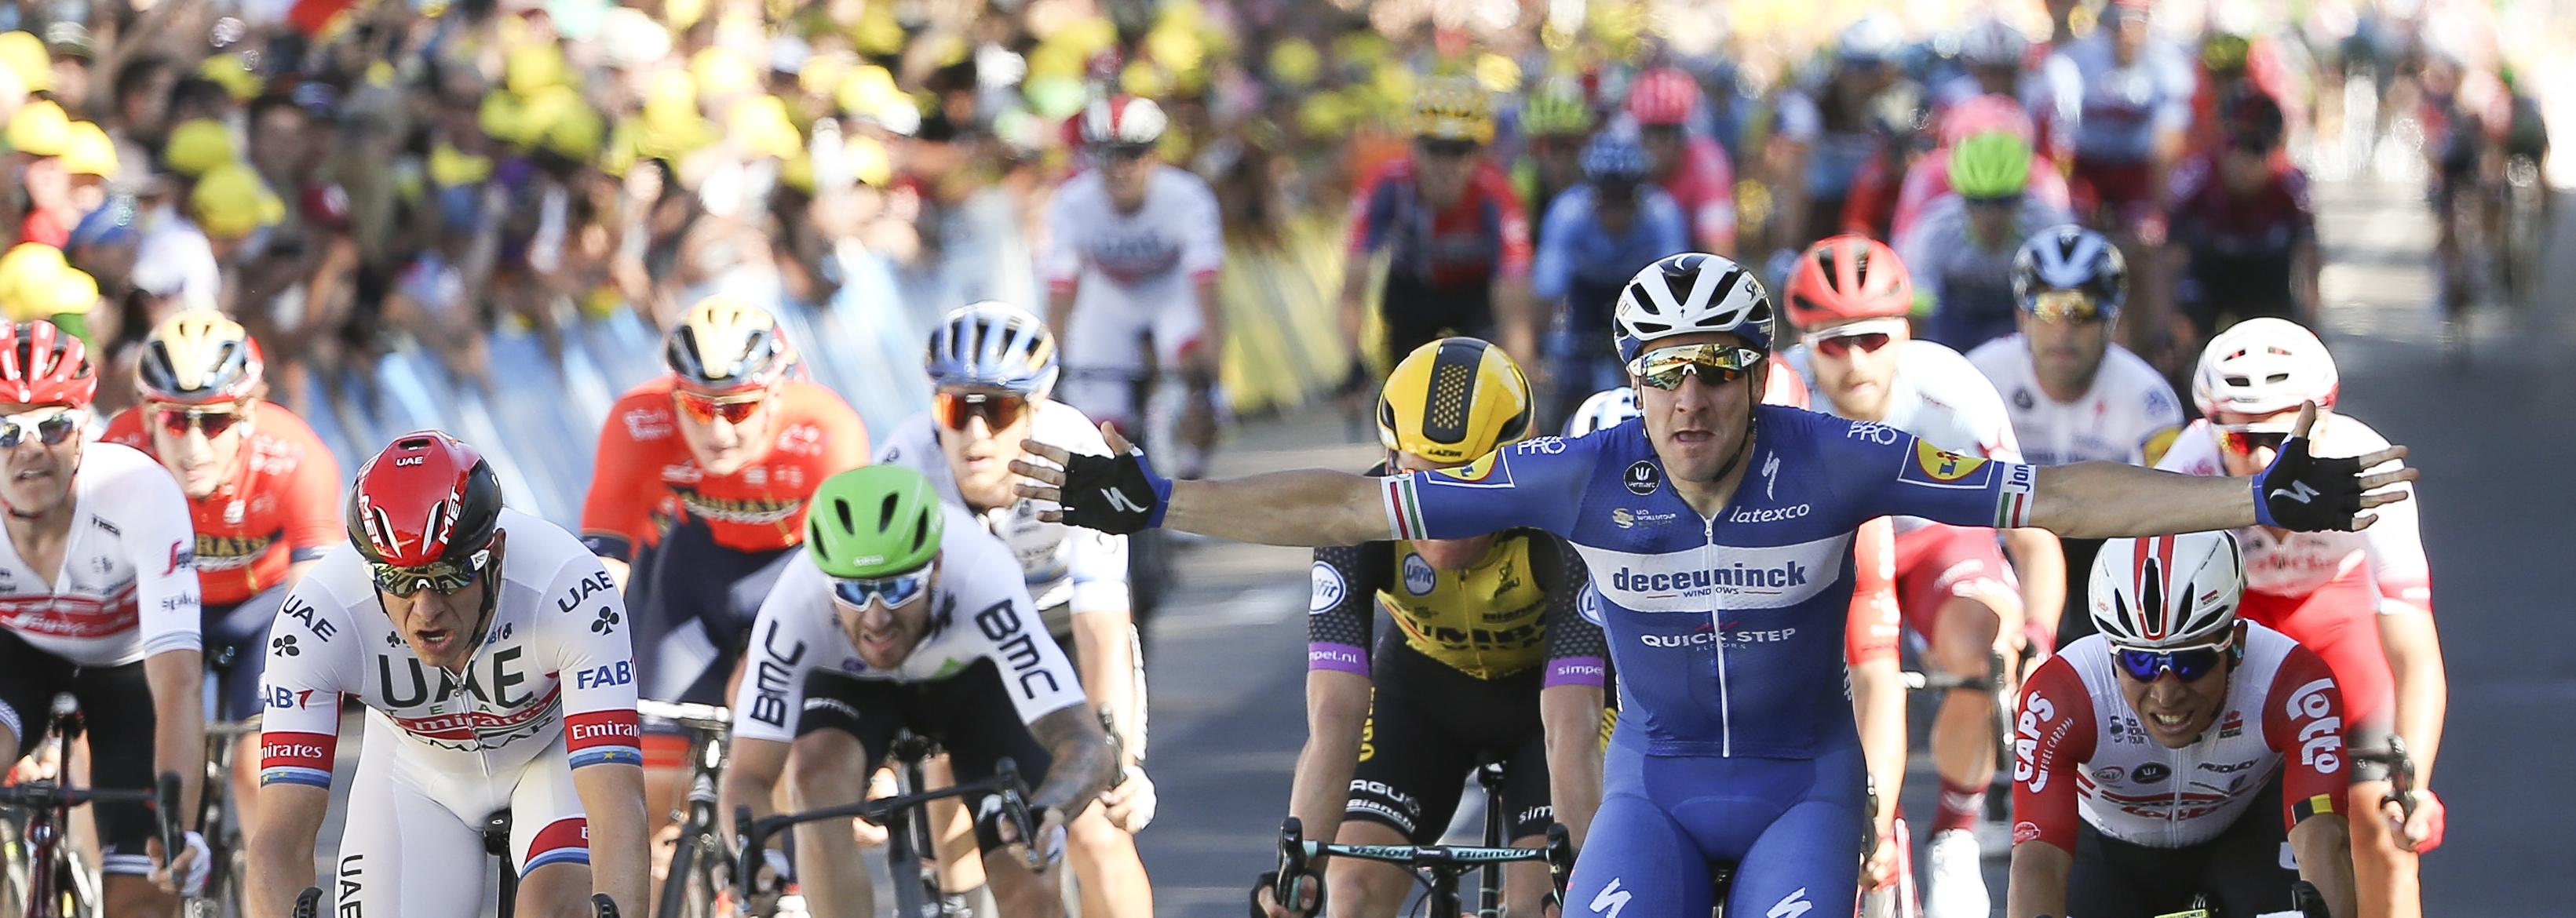 Tour de France 2019, tappa 11: Viviani cerca la rivincita